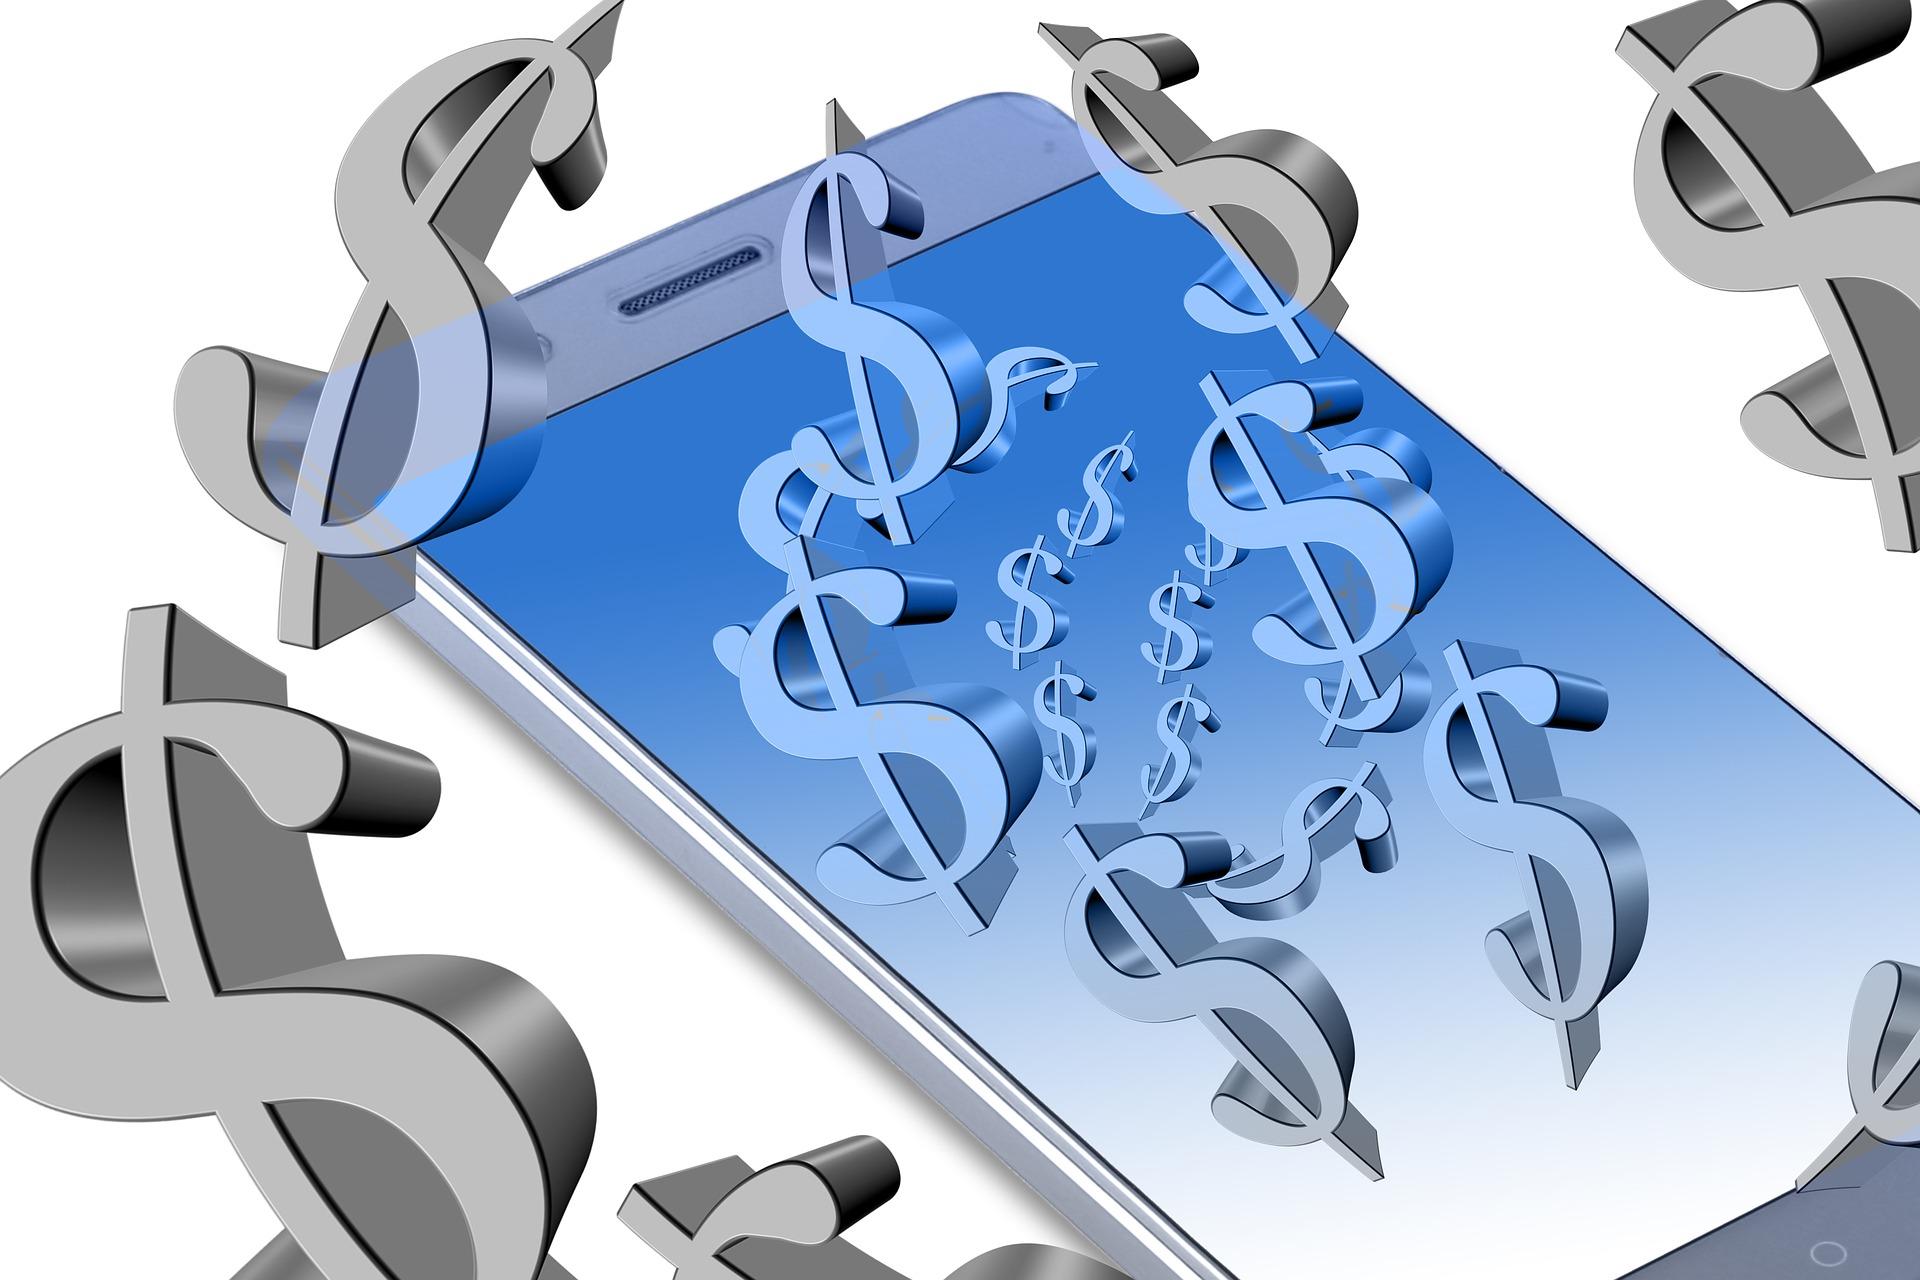 TJDFT condena banco a restituir cliente por conta invadida após roubo de celular